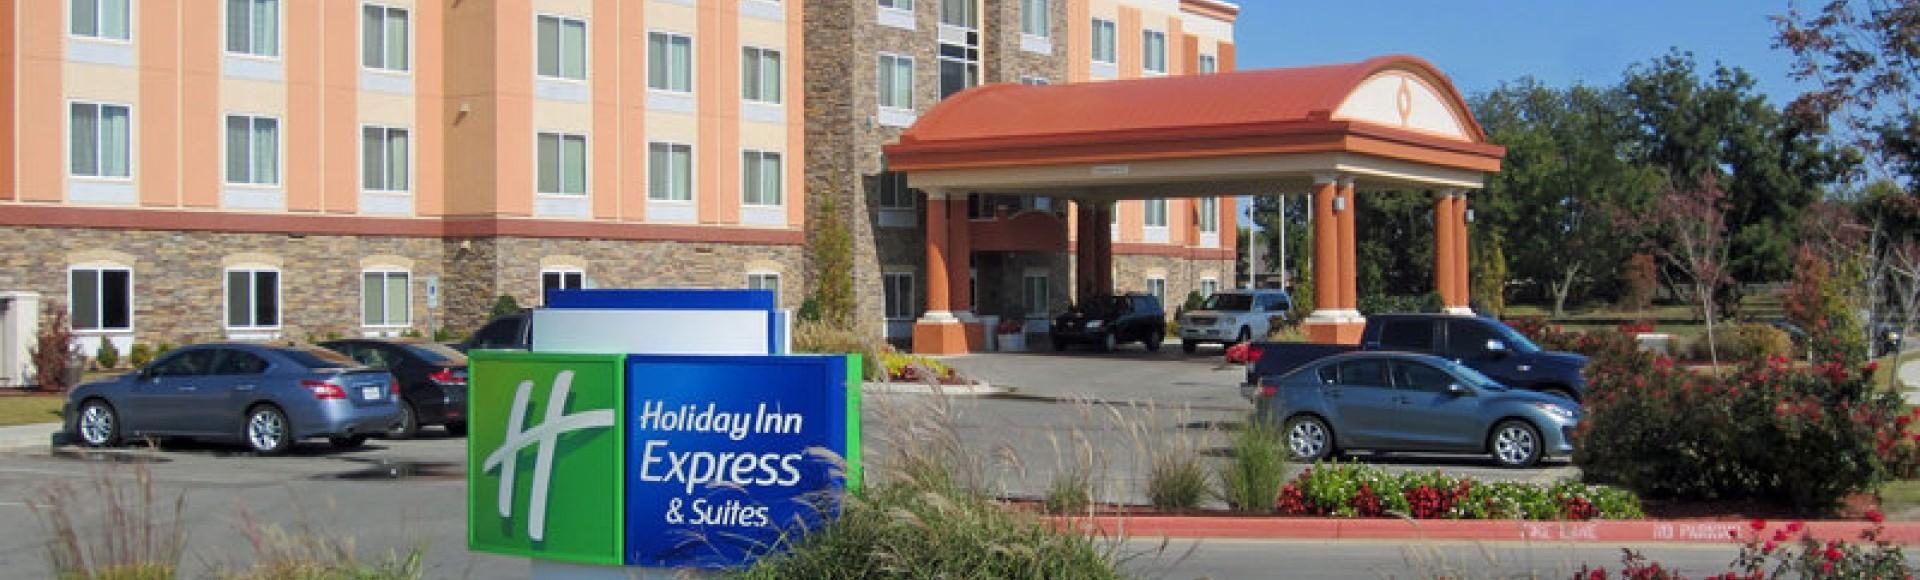 Holiday Inn Express Tulsa OK